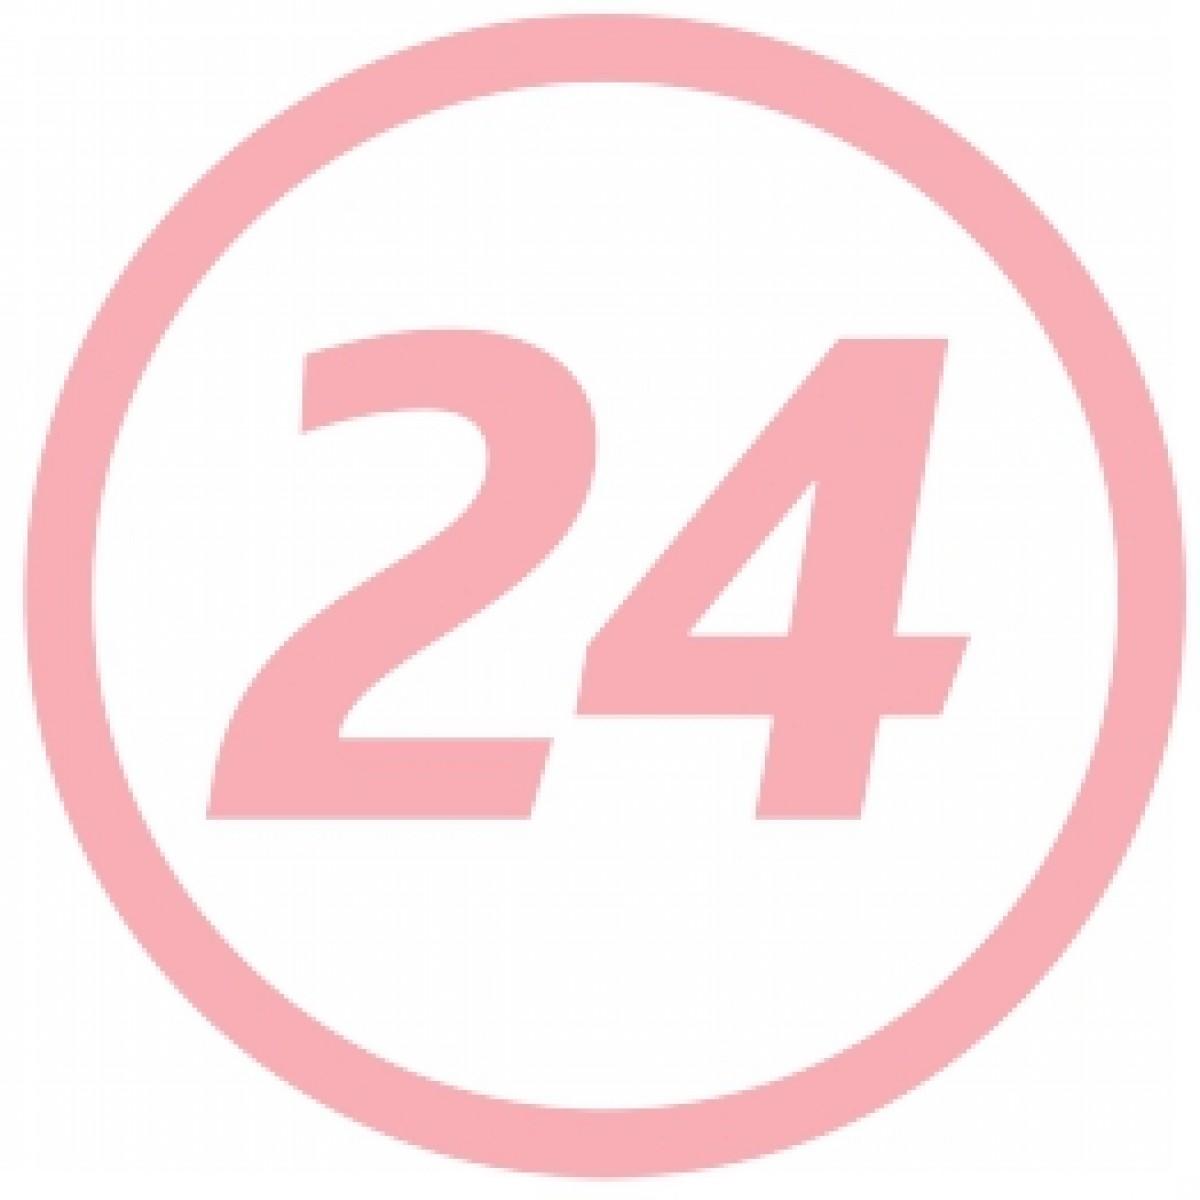 NUK Suzeta Din Silicon MICKEY, Marimea 2 (6-18Luni), Suzeta, 1 buc